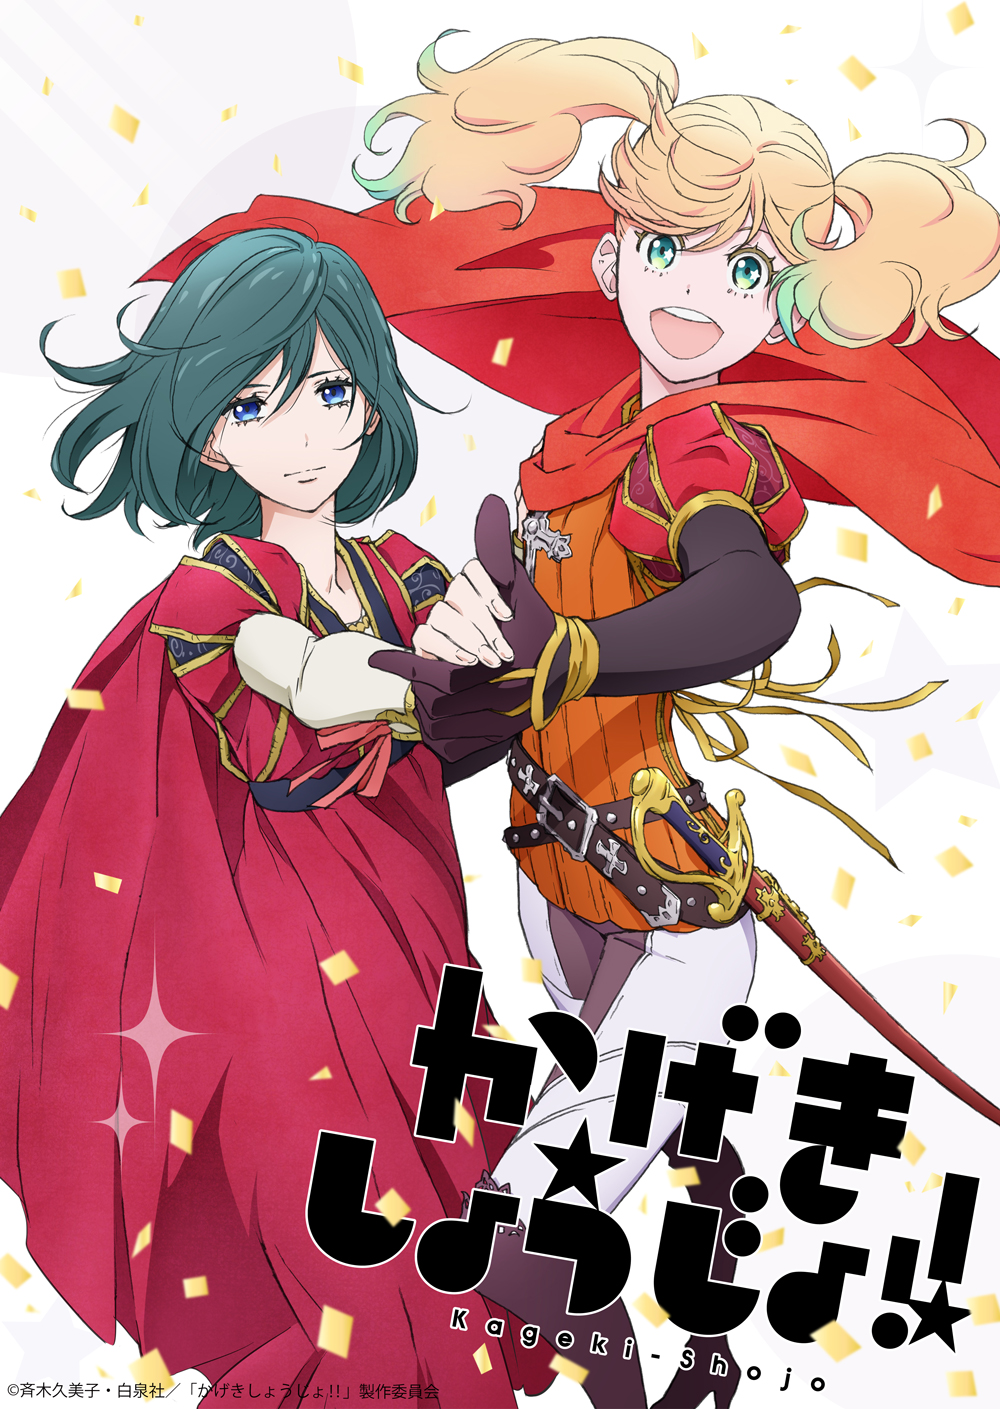 'Kageki Shoujo!!' Manga Receives TV Anime Adaptation in 2021